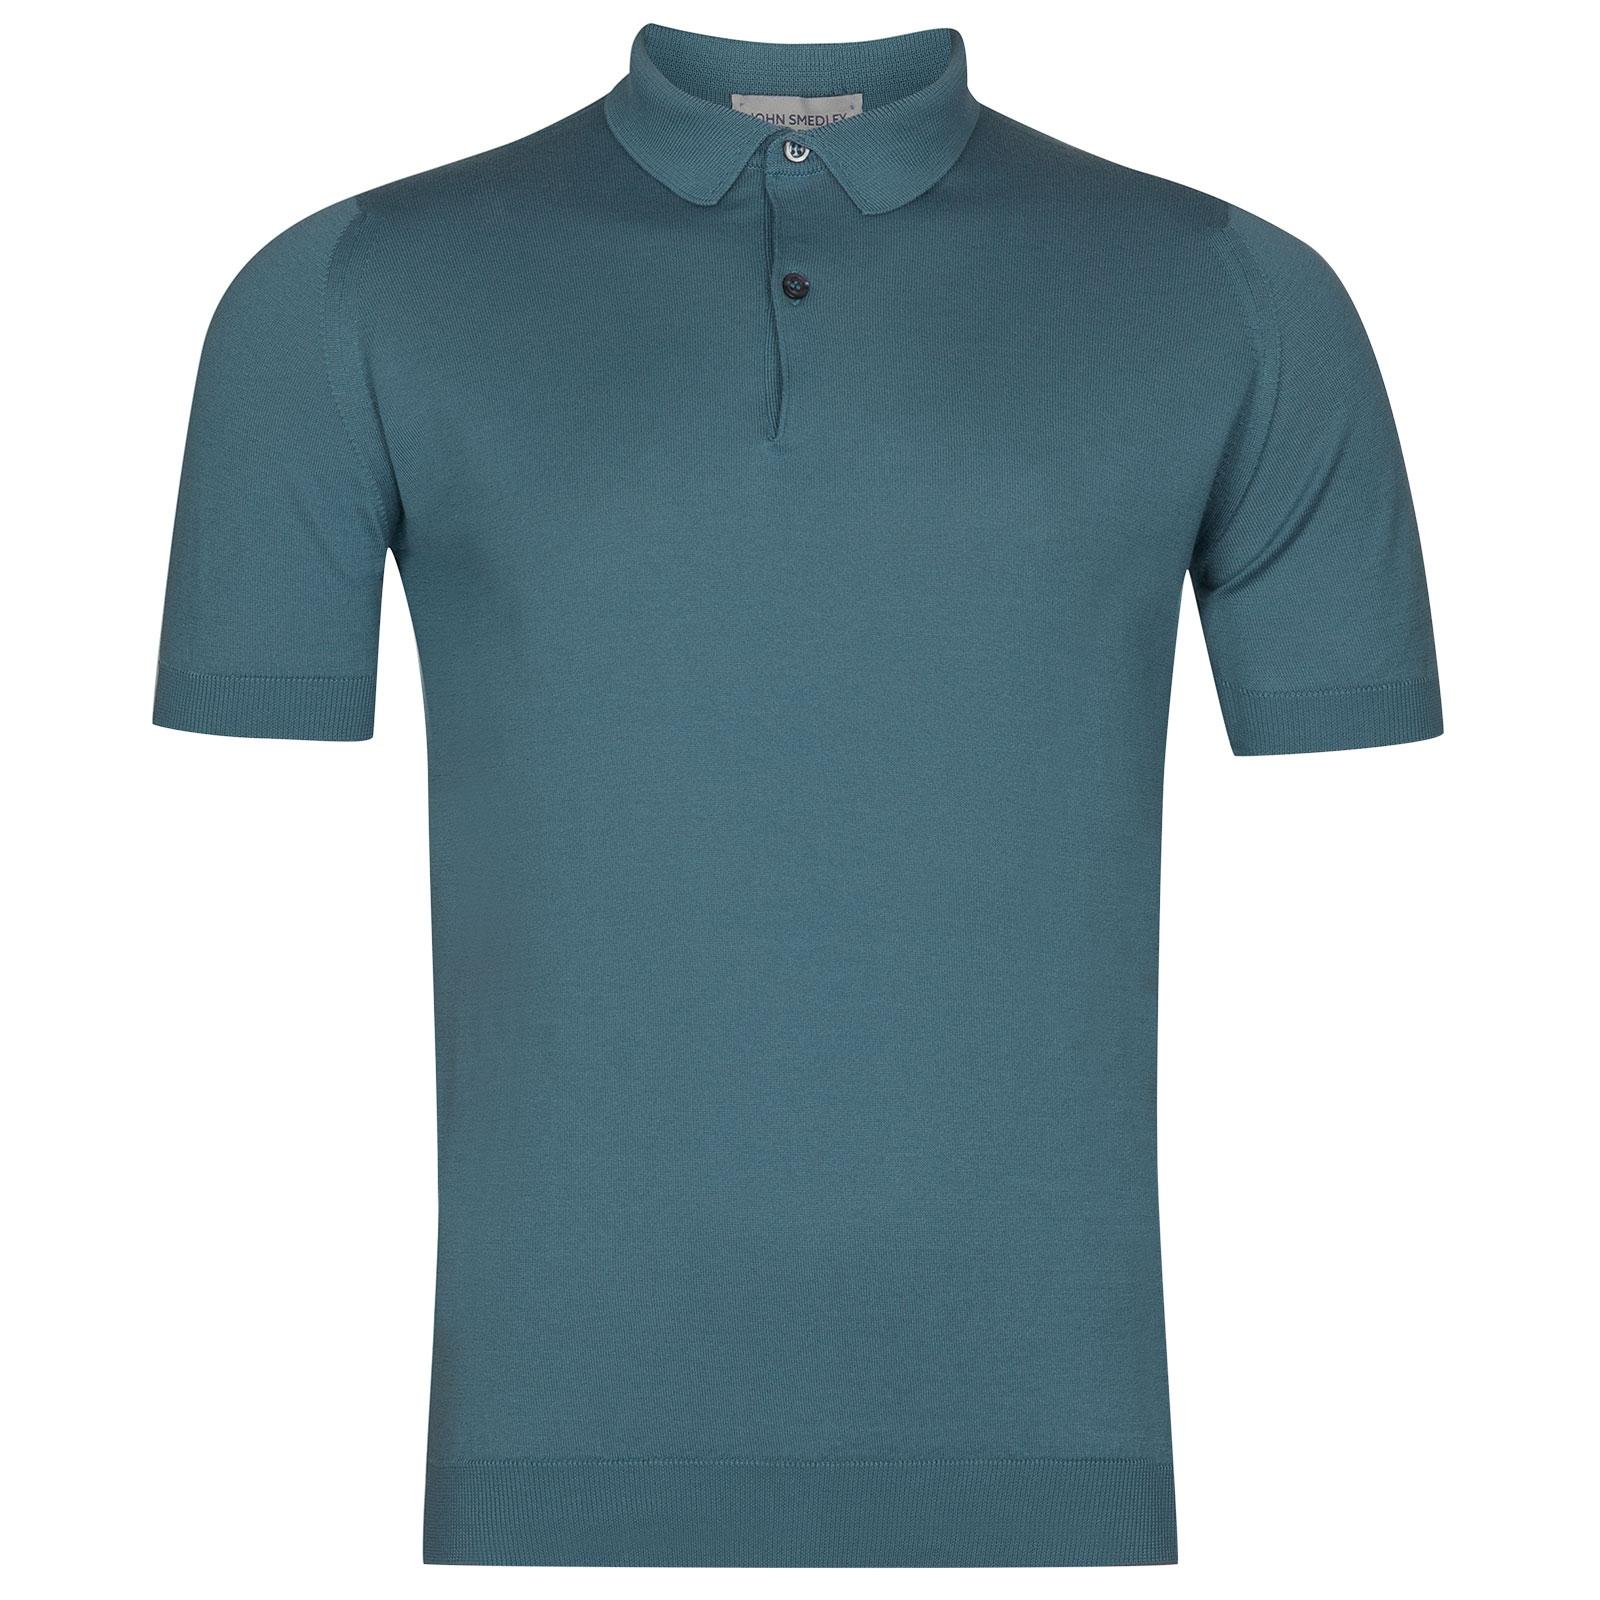 John Smedley Rhodes in Dewdrop Blue Shirt-XXL